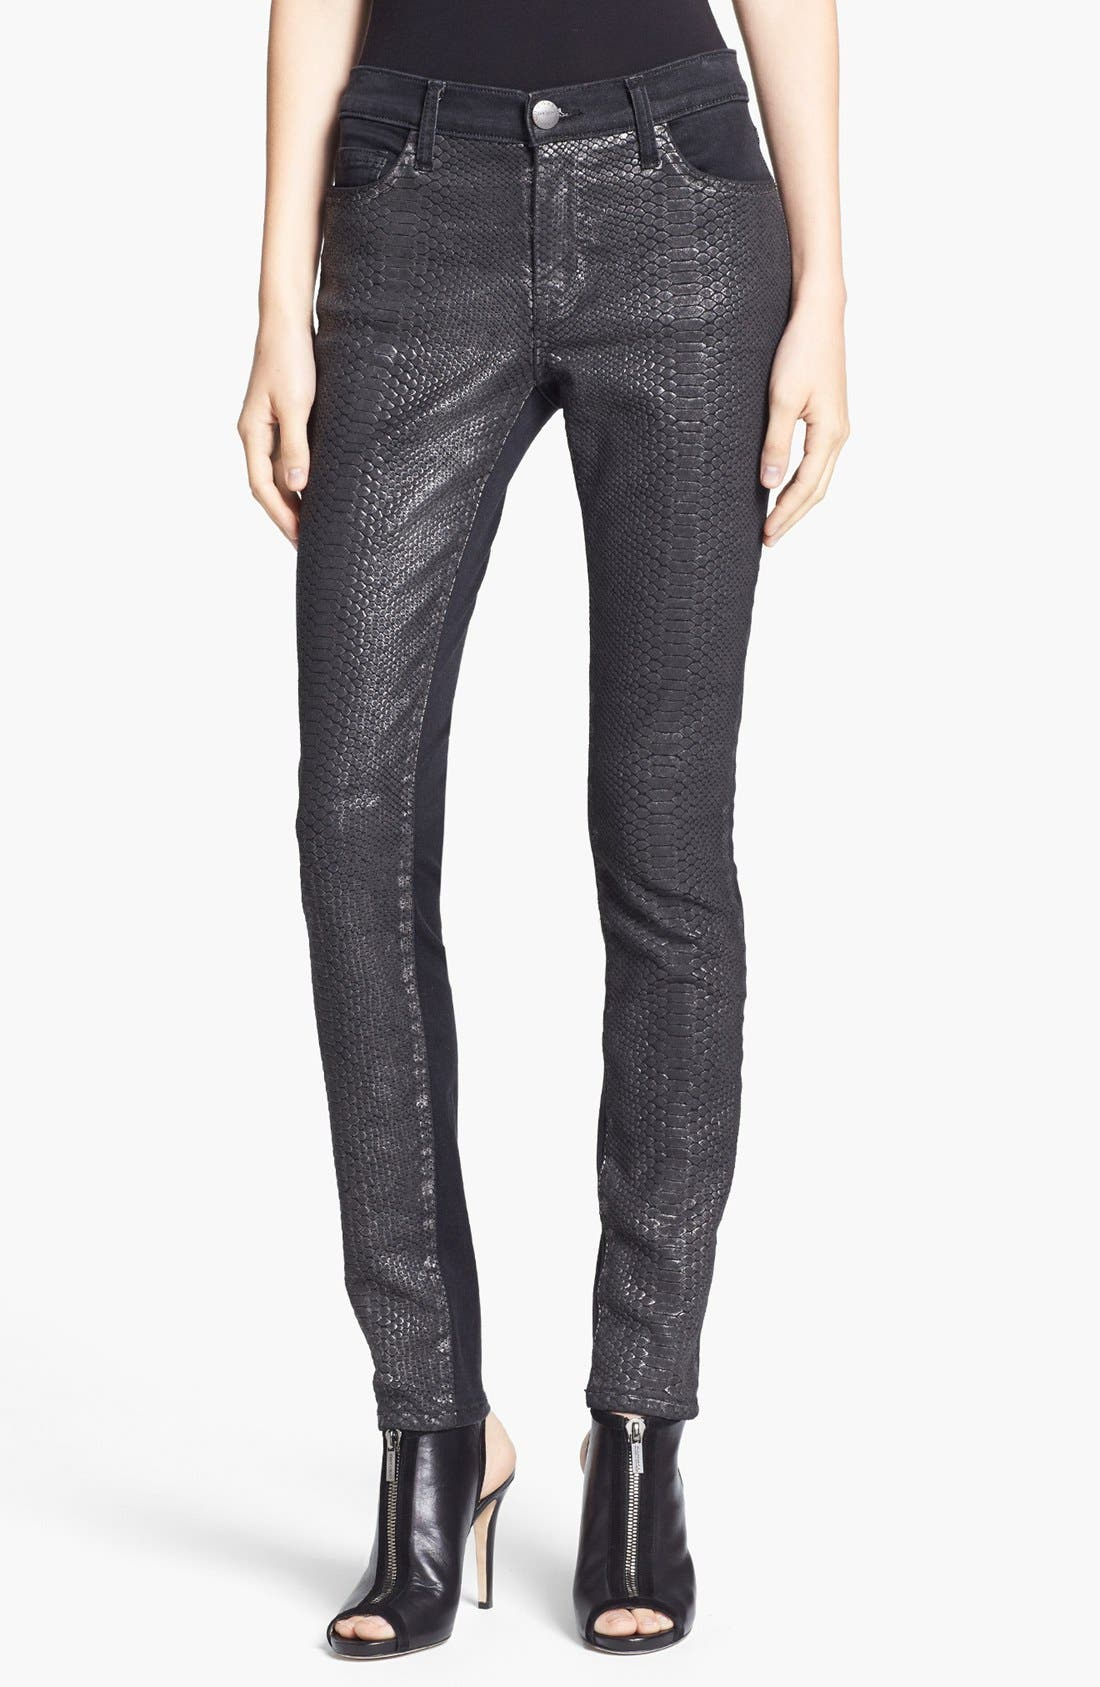 Main Image - Current/Elliott 'The Ankle Skinny' Coated Animal Print Jeans